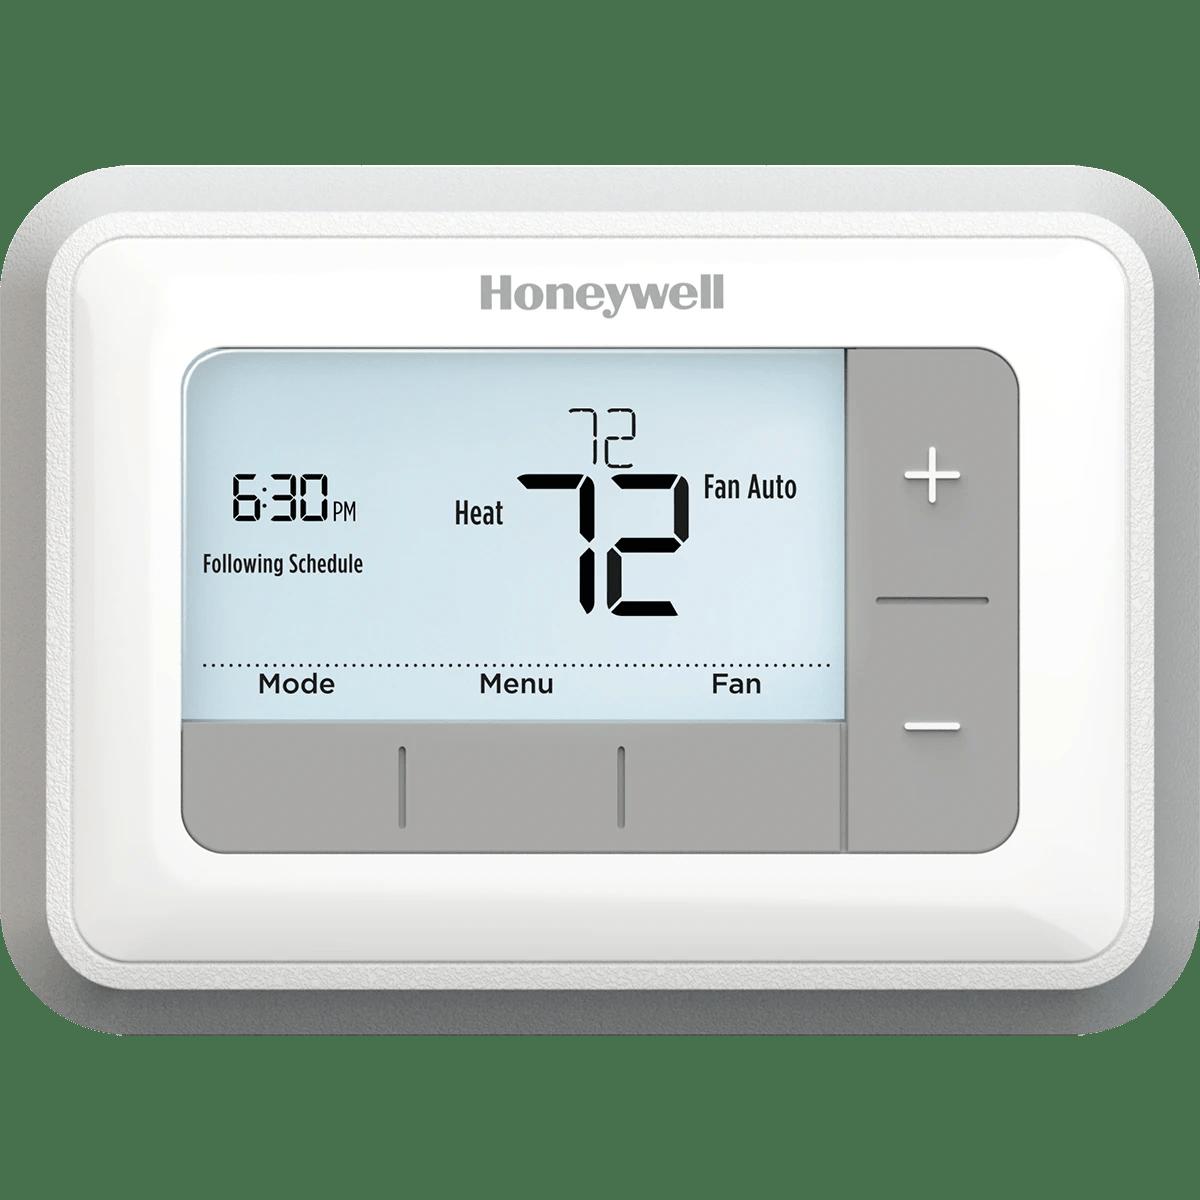 Honeywell Millivolt Wiring Diagrams Auto Electrical Diagram Subaru Baja 2994 Thermostat Ct31a1003 45